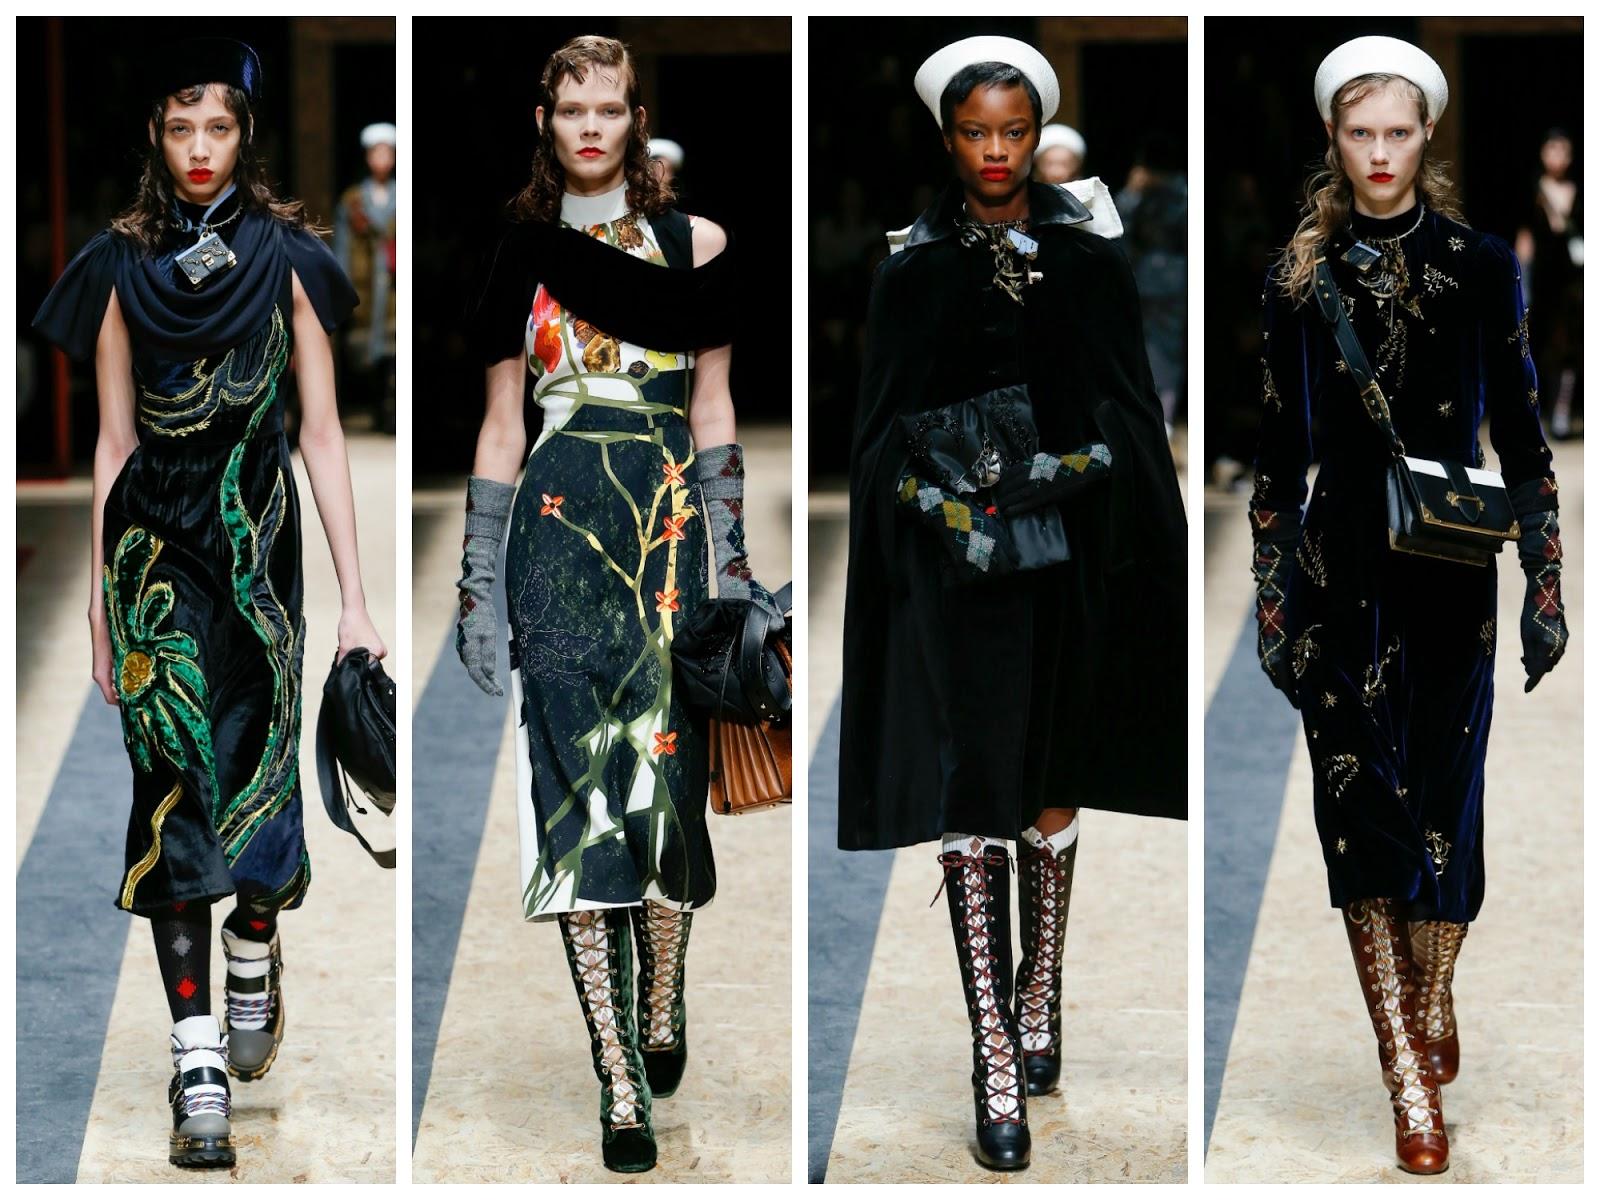 prada-fall-winter-2016-fashion-show-collection-milan